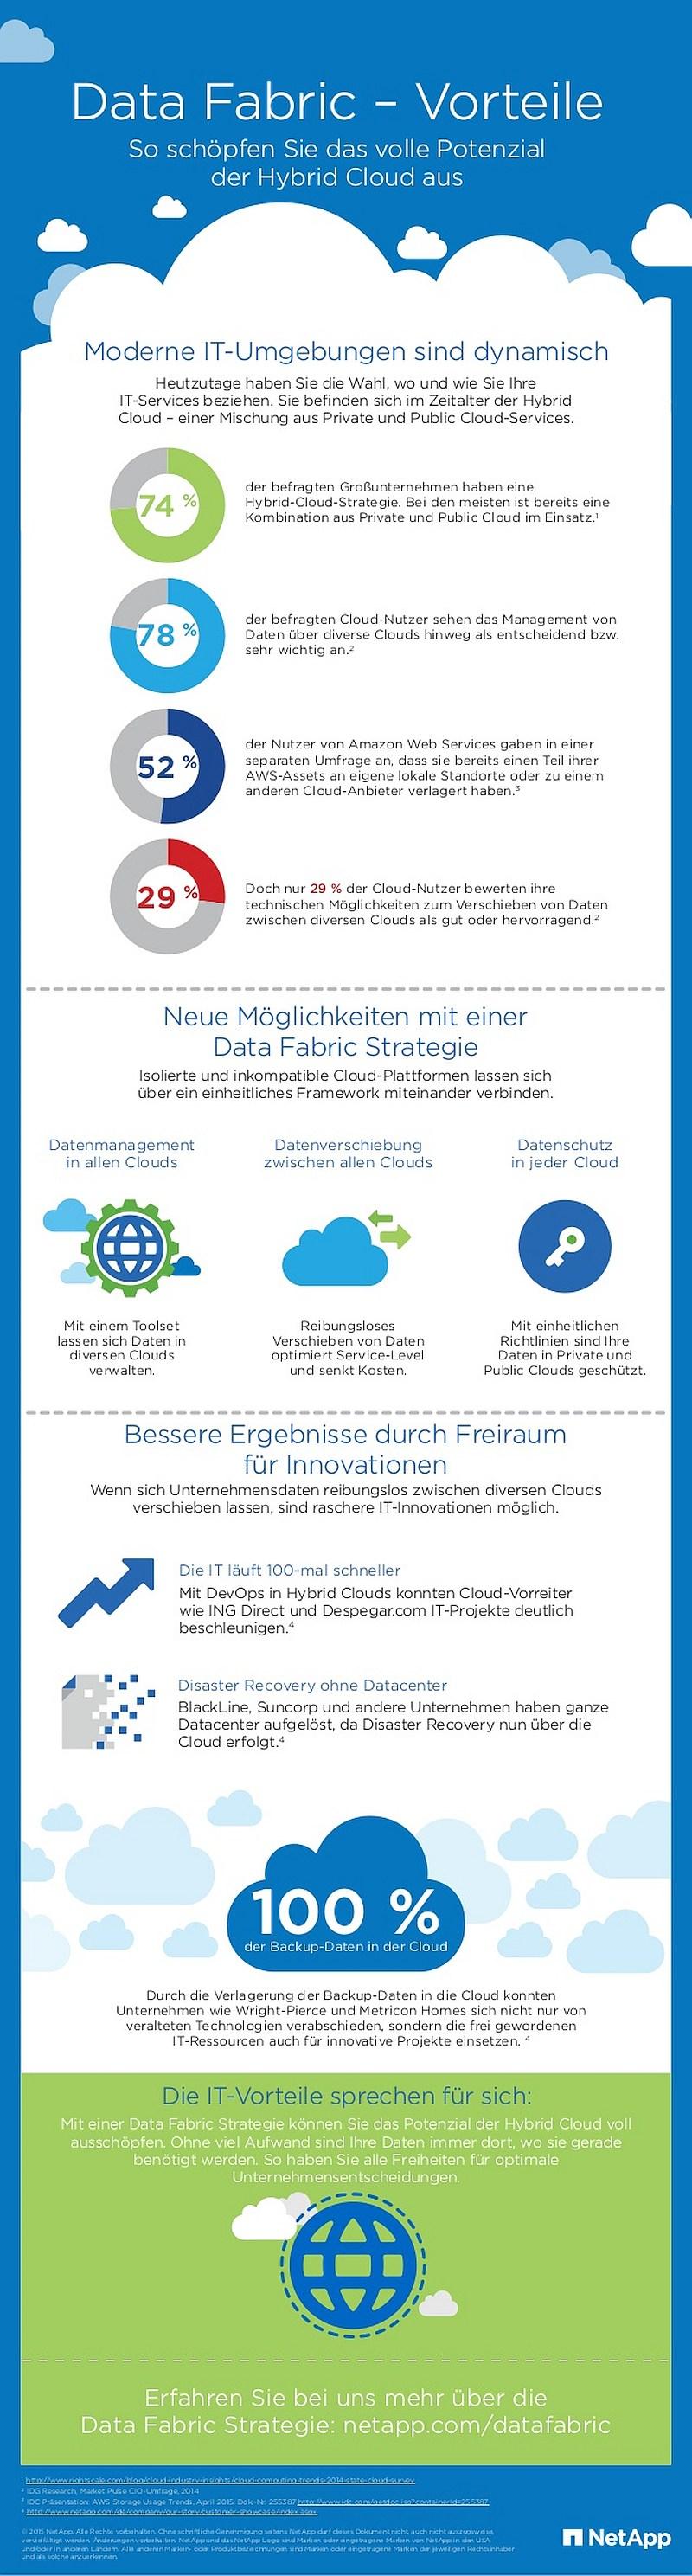 infografik netapp data fabric